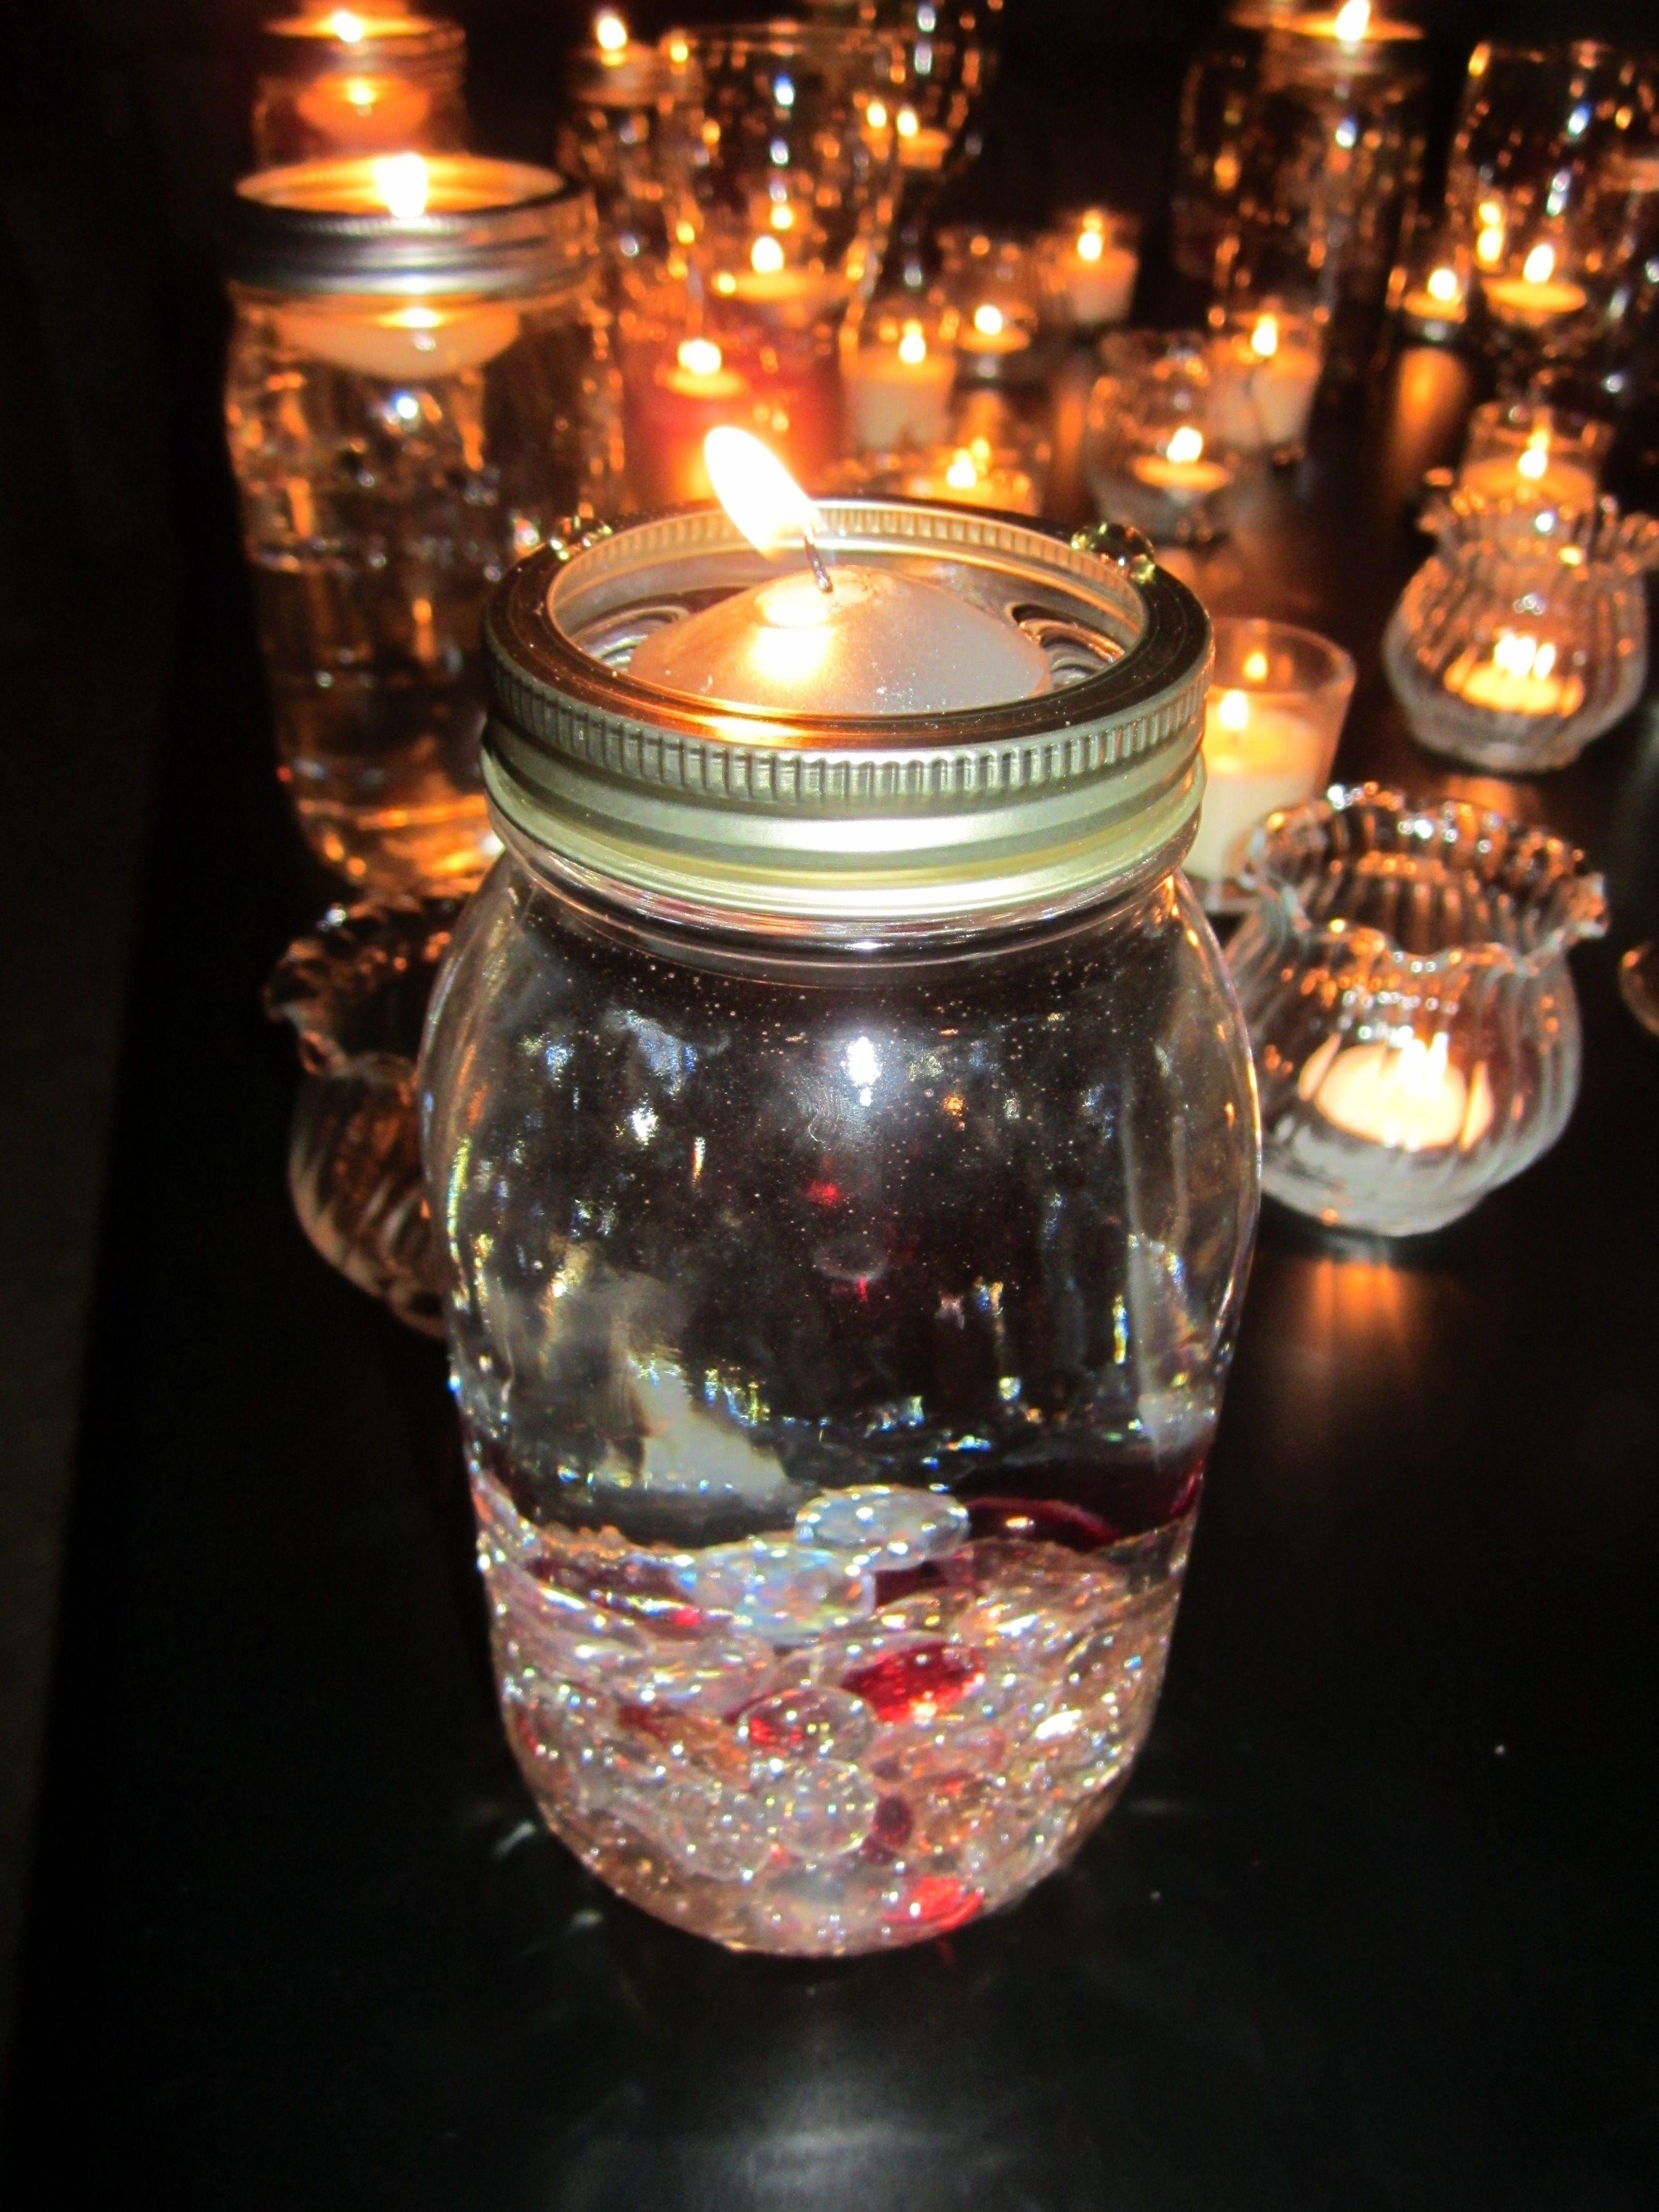 Pin By Jennifer Boyd On Idea Romantic Date Night Ideas Romantic Dates Family Dinner Night